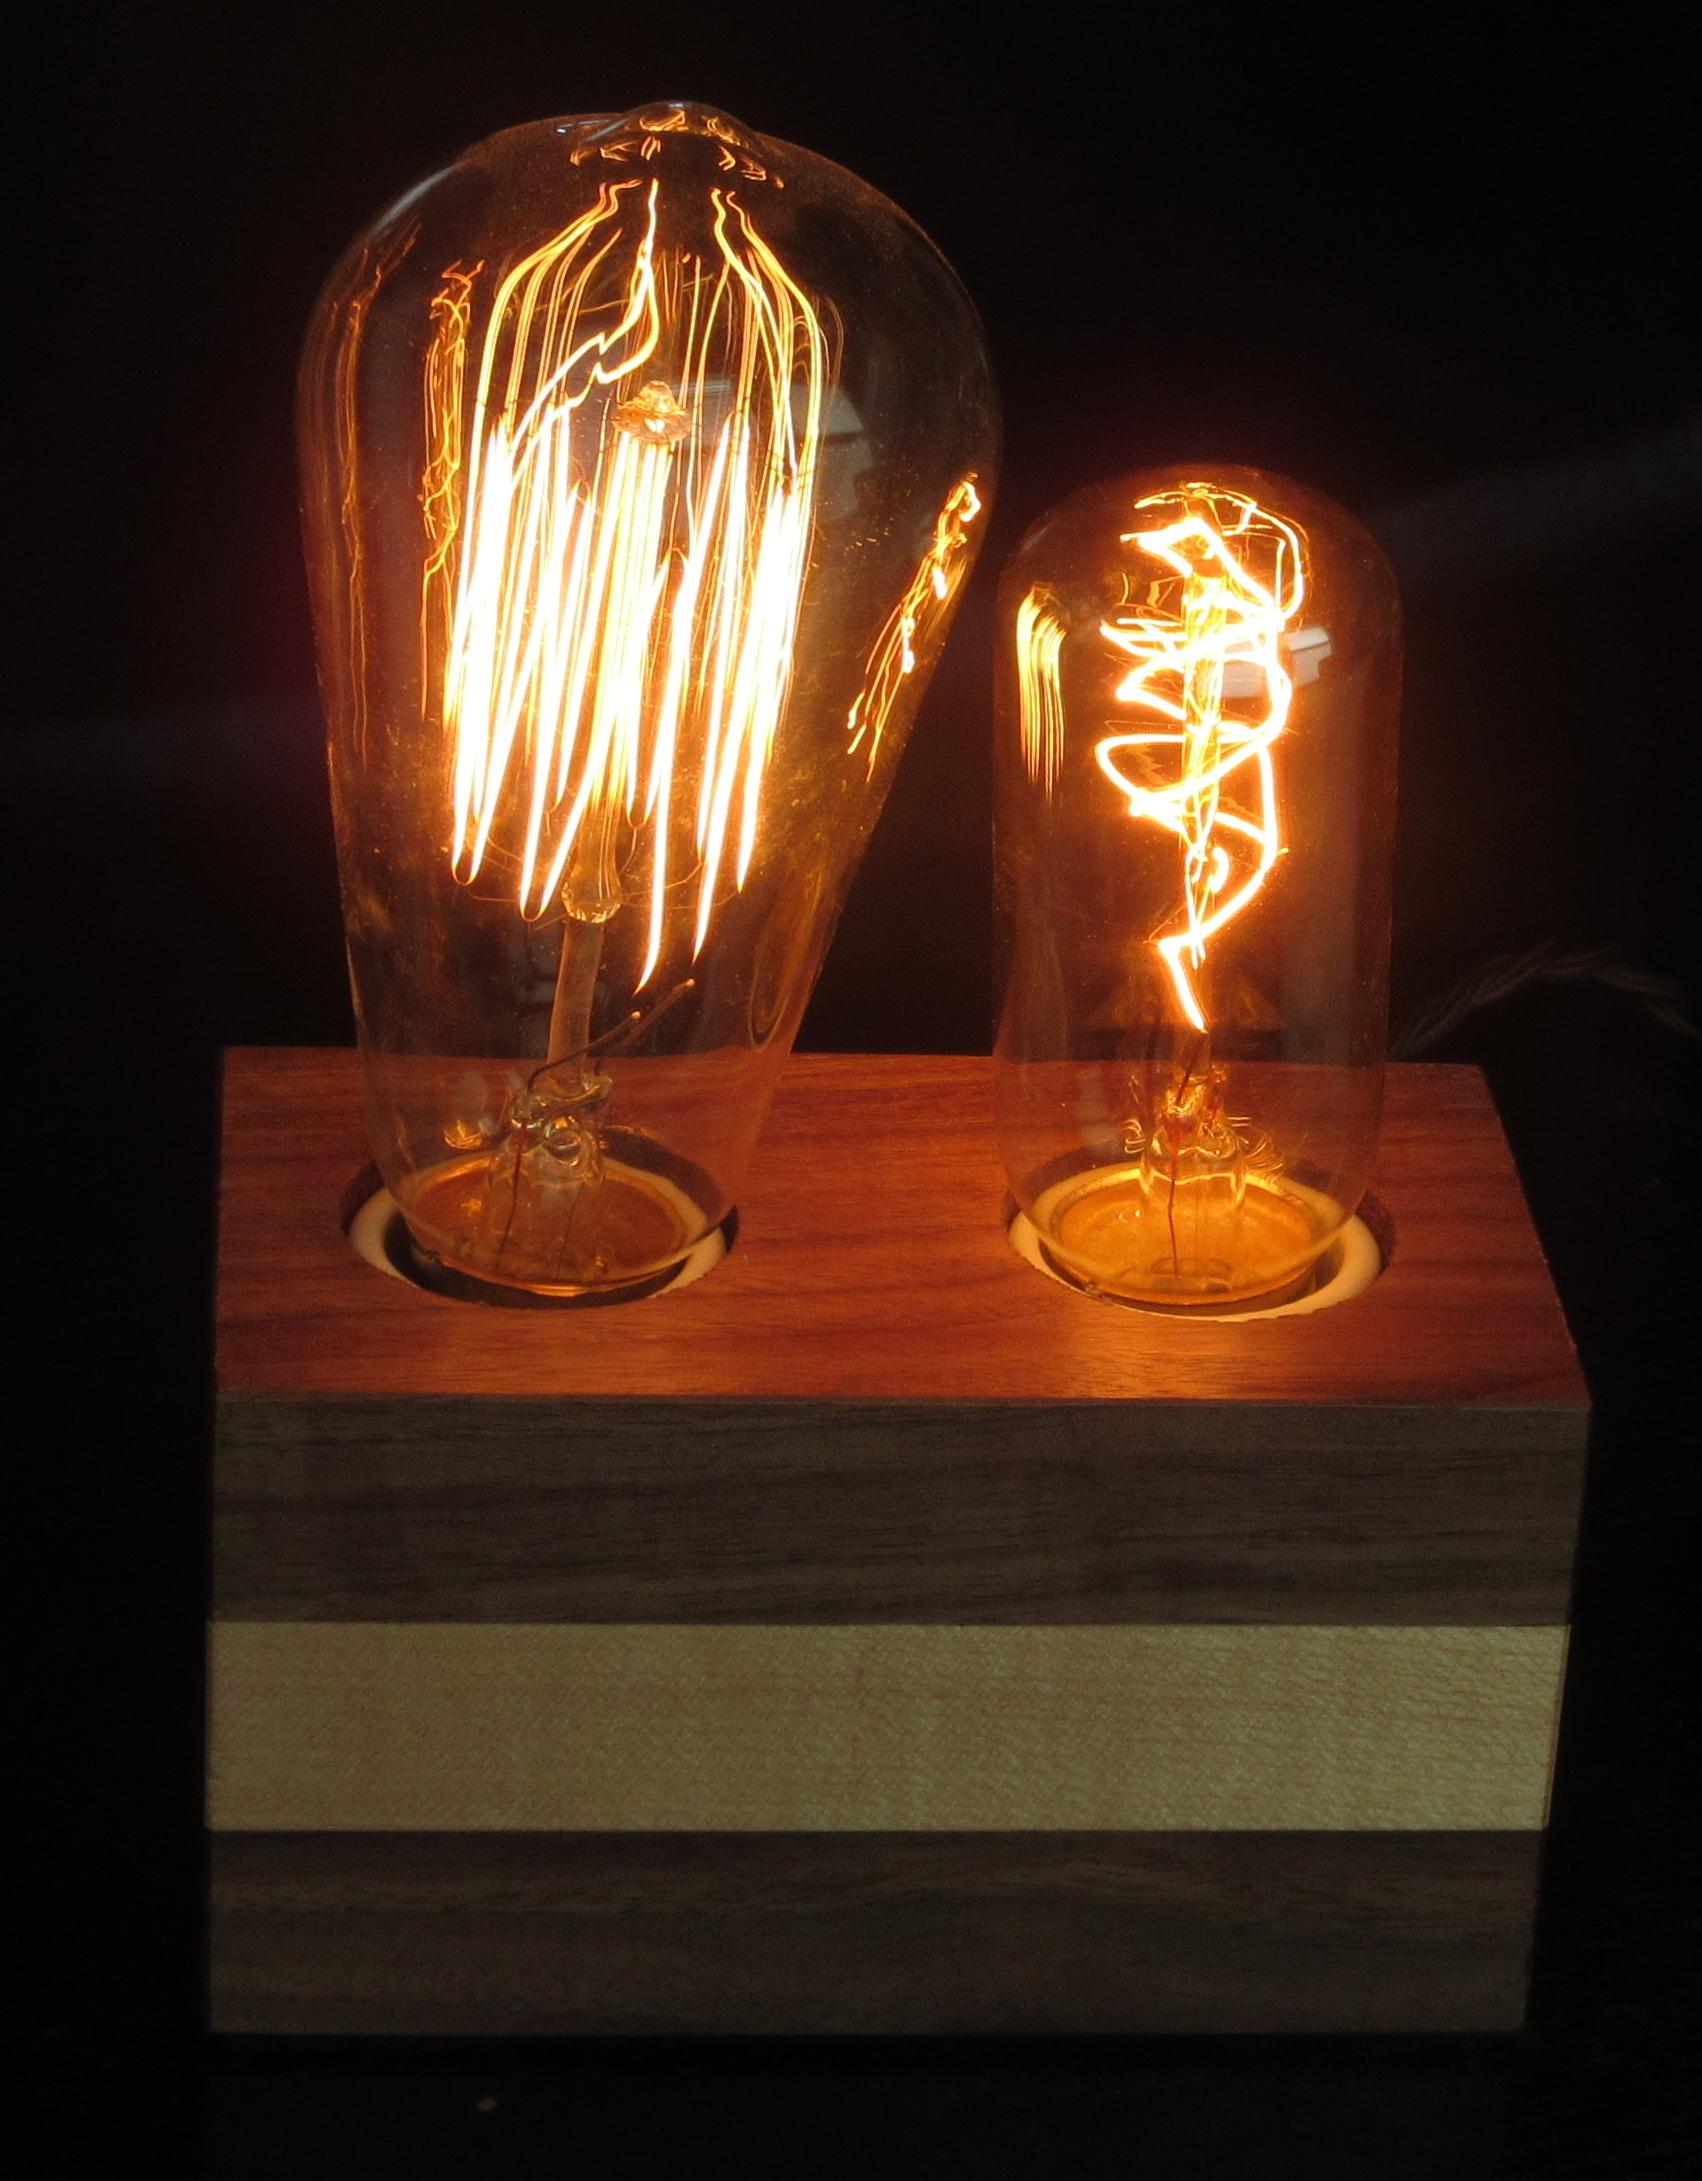 Walnut with Horizontal Maple Stripe - 2 lamps